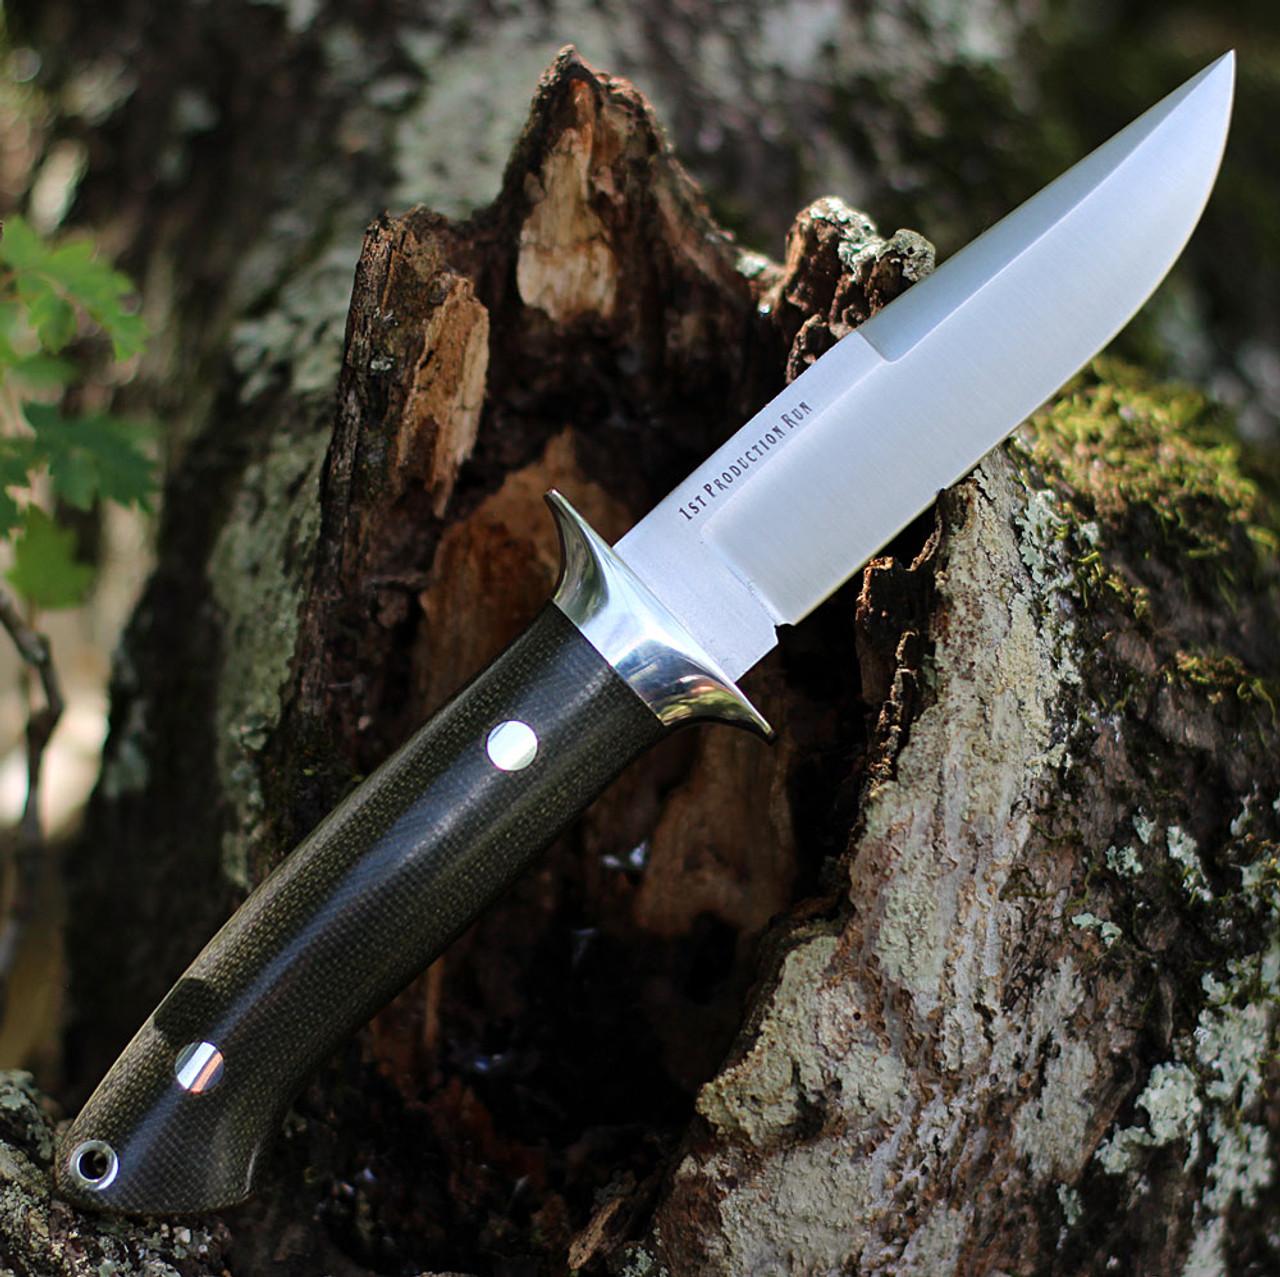 "Bark River Knives Chute Knife 07152MGC, 4.25"" CPM-154 Drop Point Plain Blade, Green Canvas Handle"